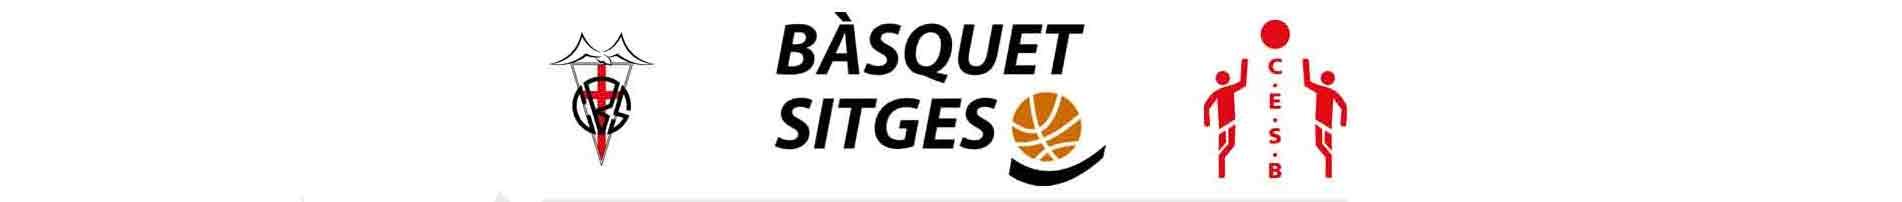 Club Bàsquet Sitges